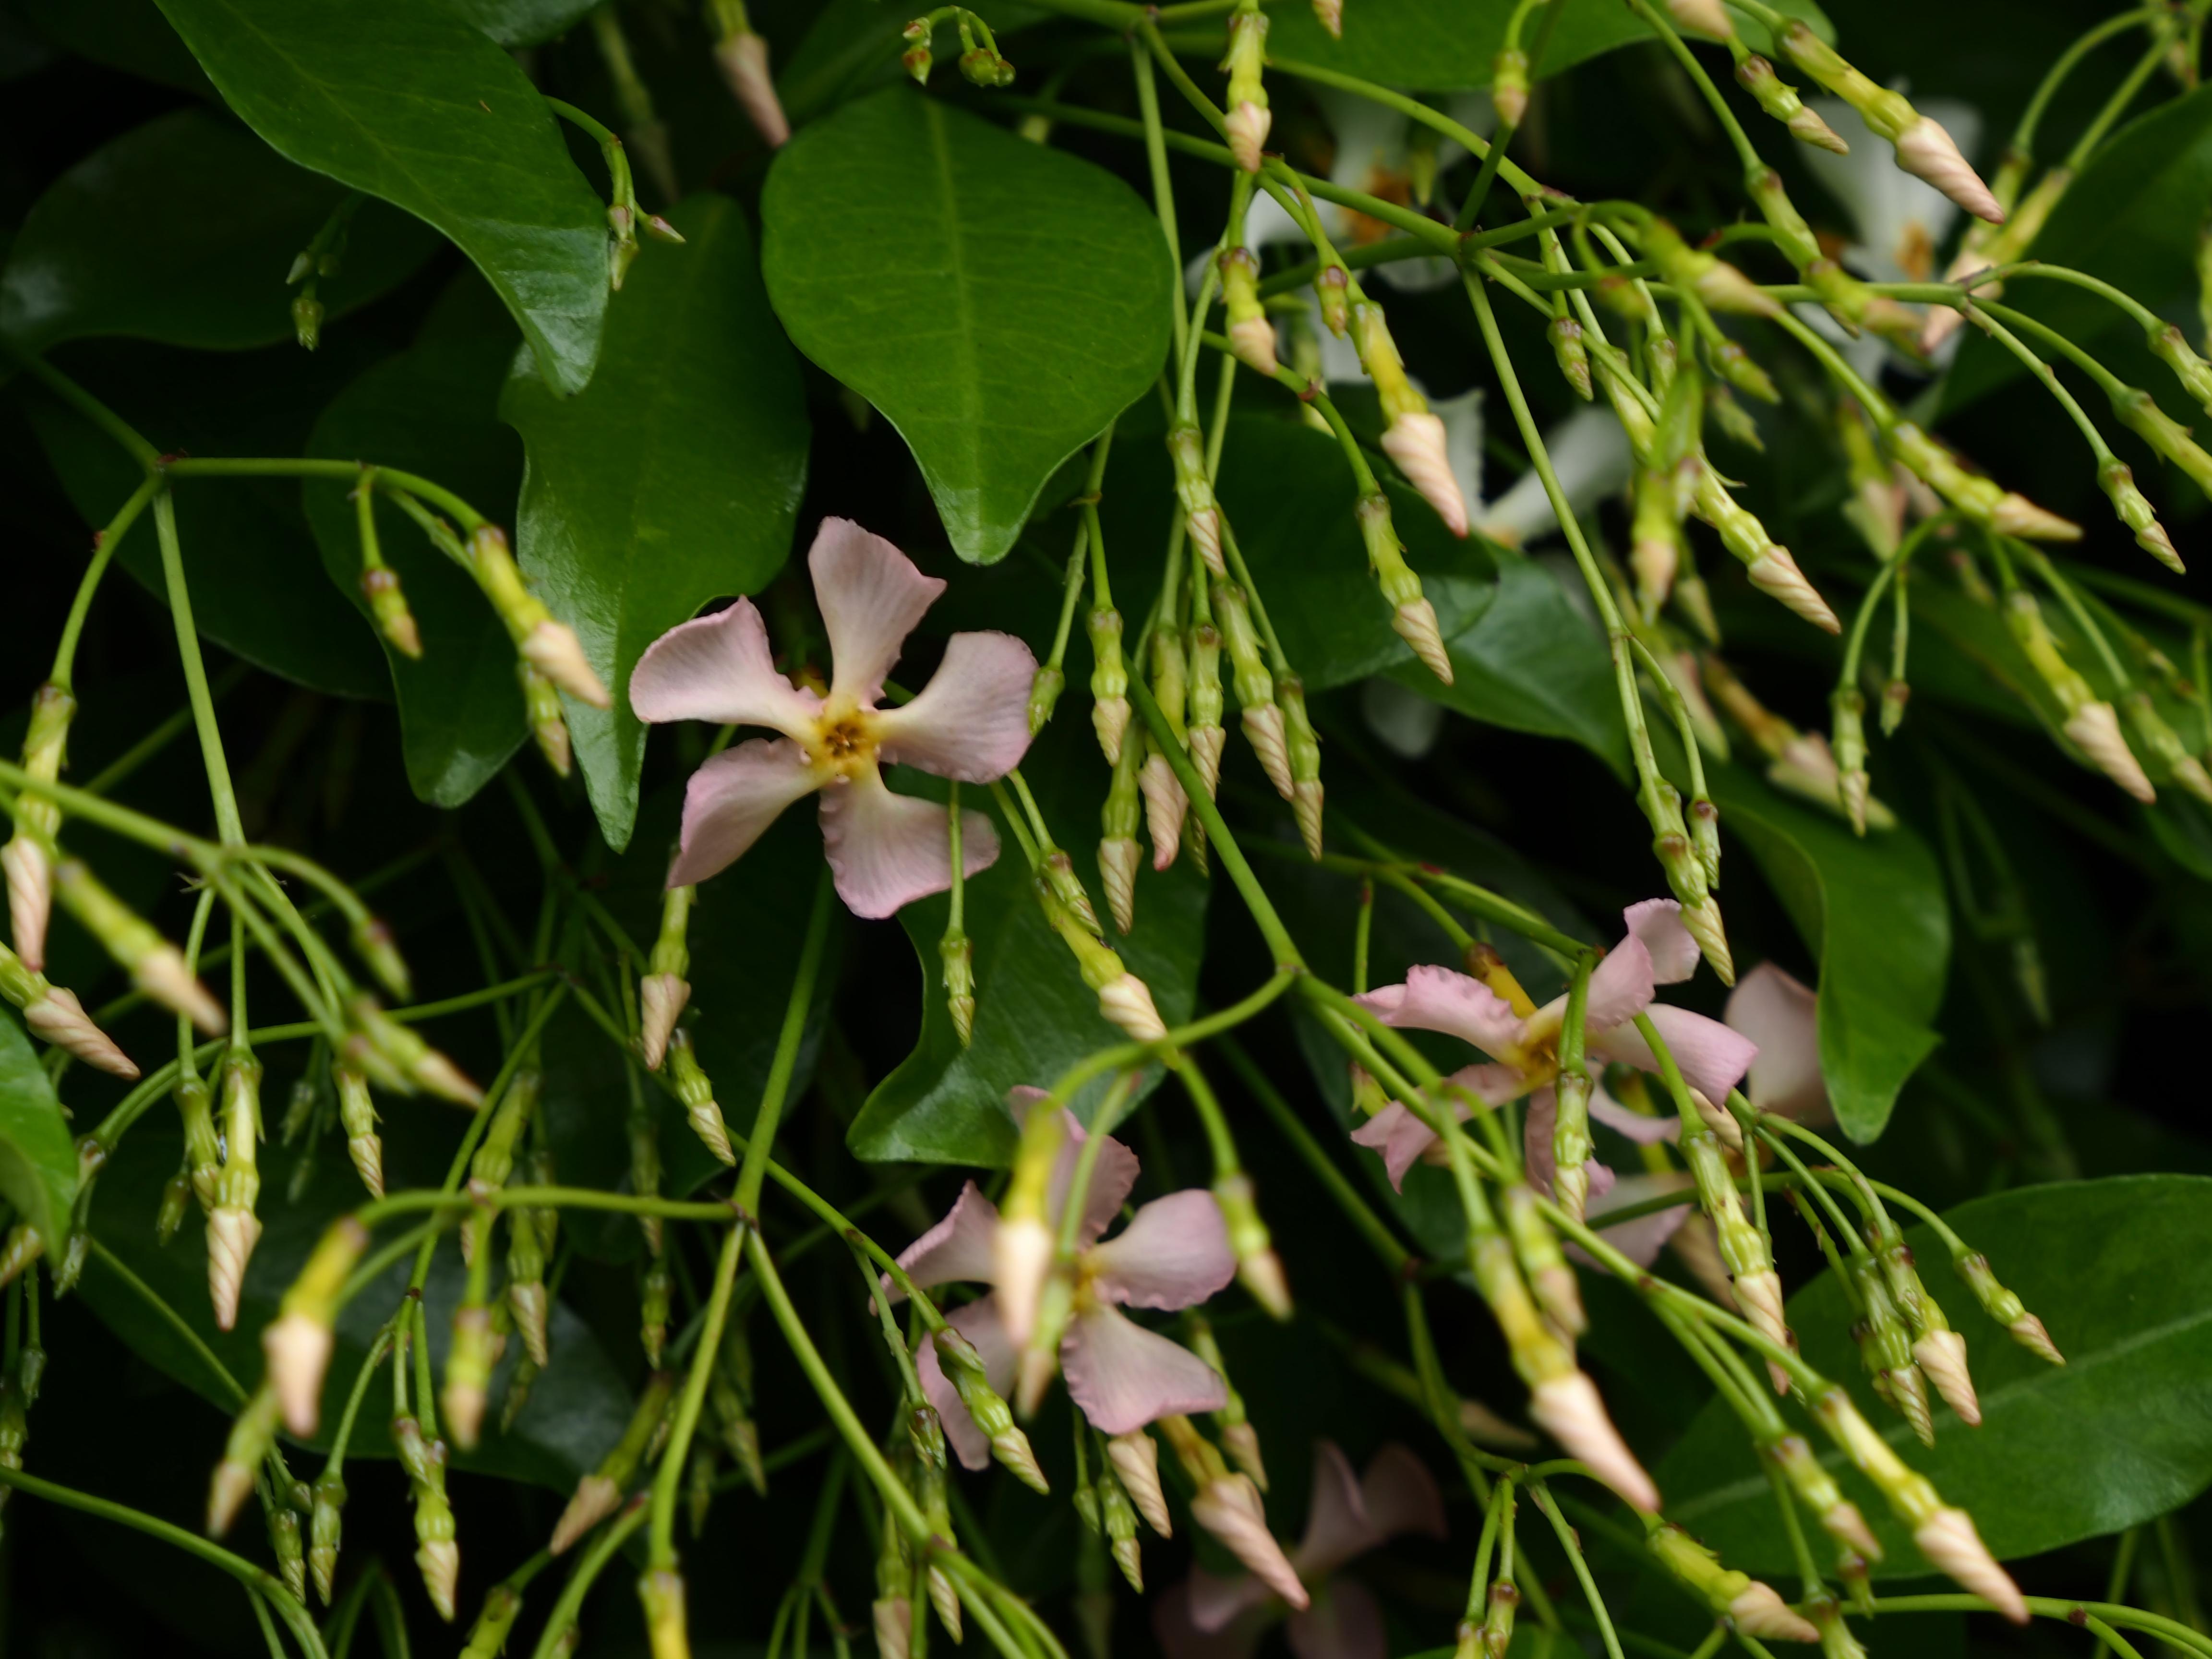 Trachelospermum asiaticum<br />トラケロスペルマム アジアティクム ピンク(テイカカズラ) 桃花